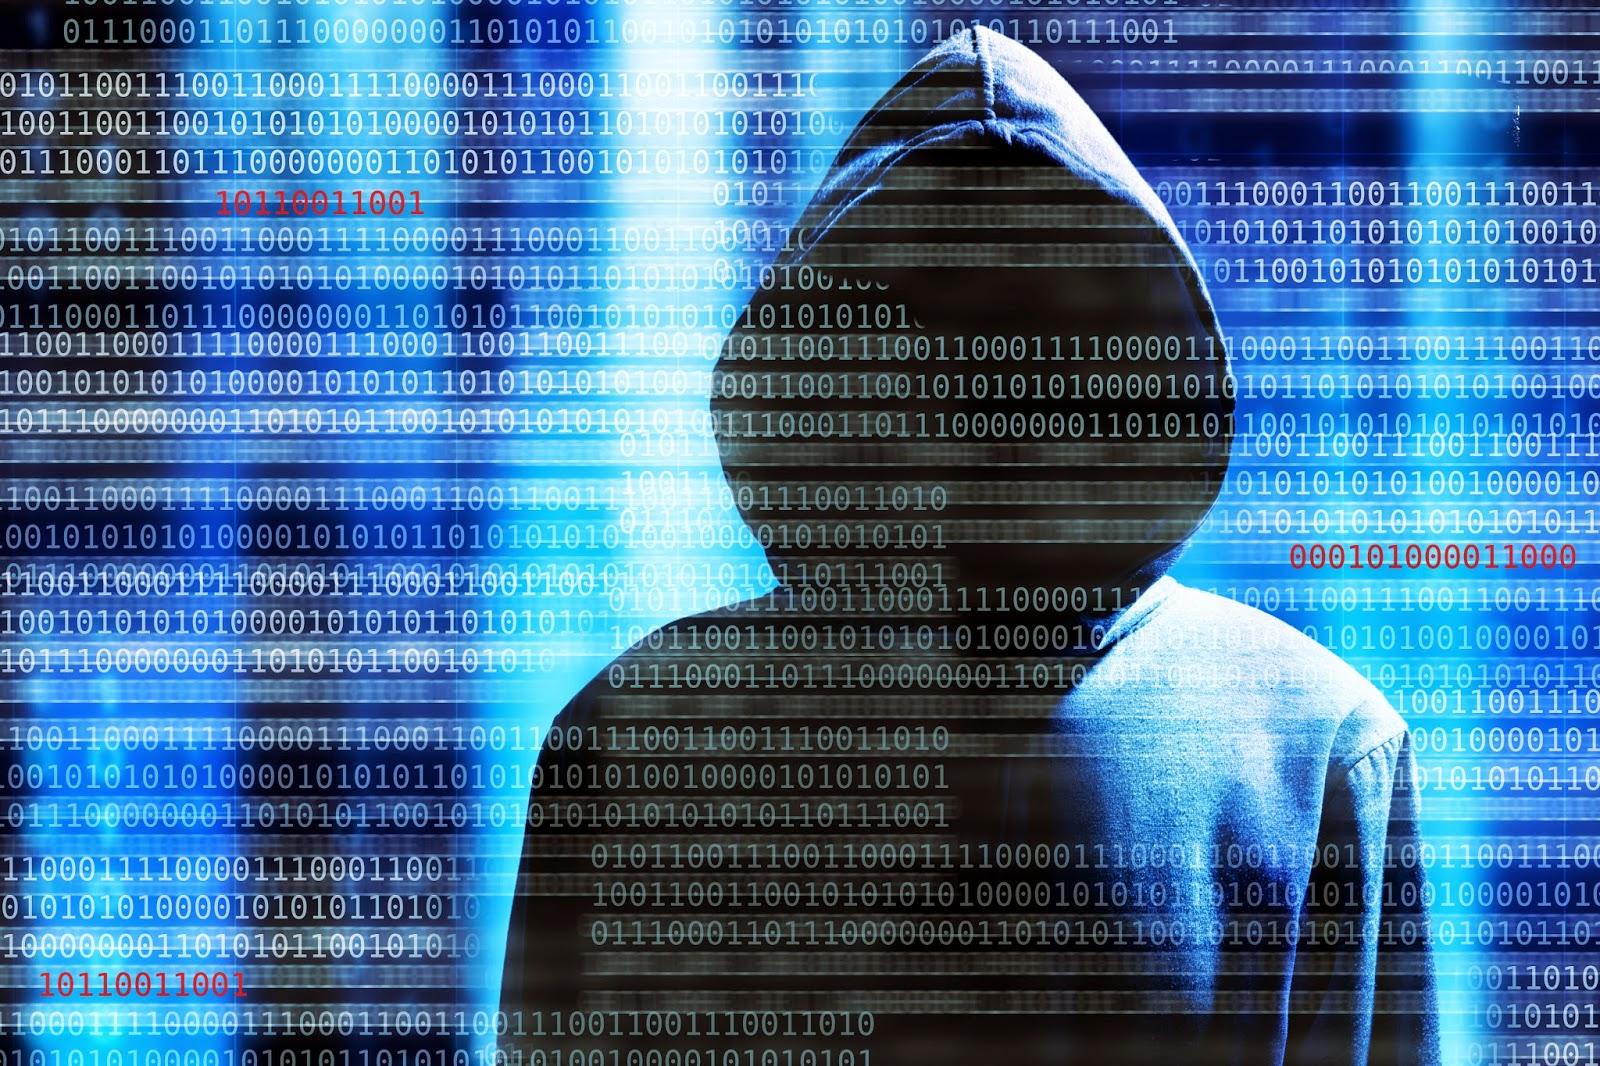 Ataques contra sistemas de cobro